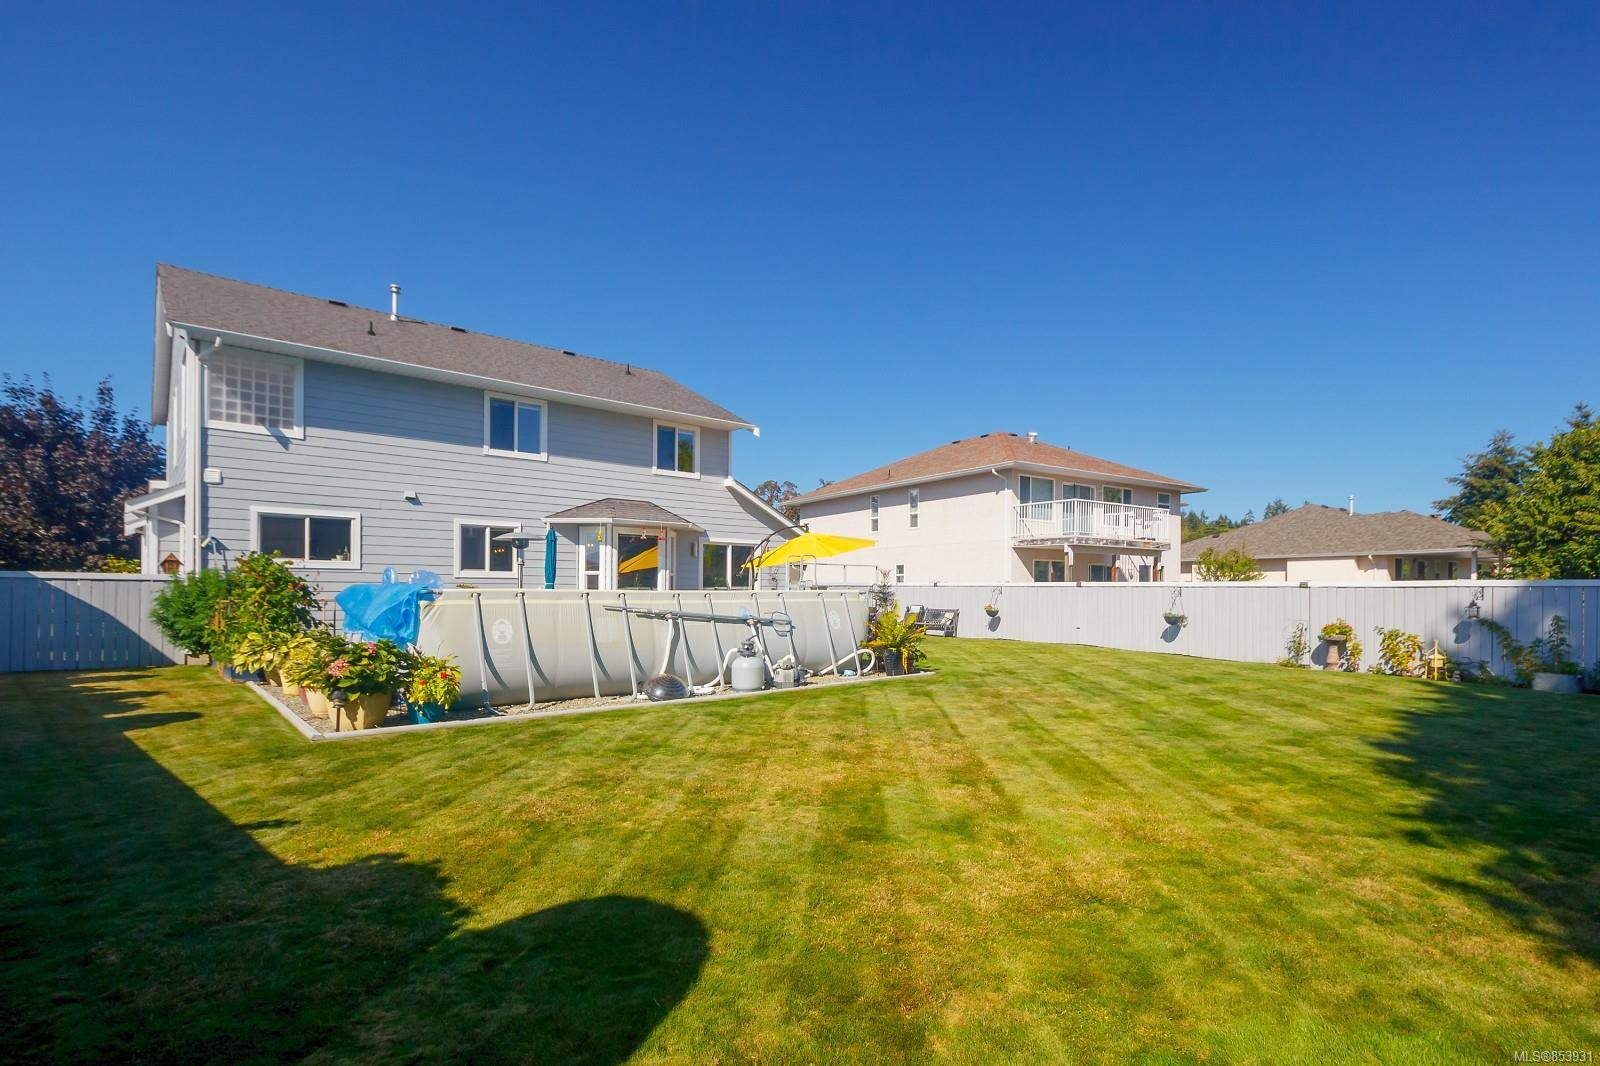 Photo 29: Photos: 2456 Timbercrest Dr in : Du East Duncan House for sale (Duncan)  : MLS®# 853931